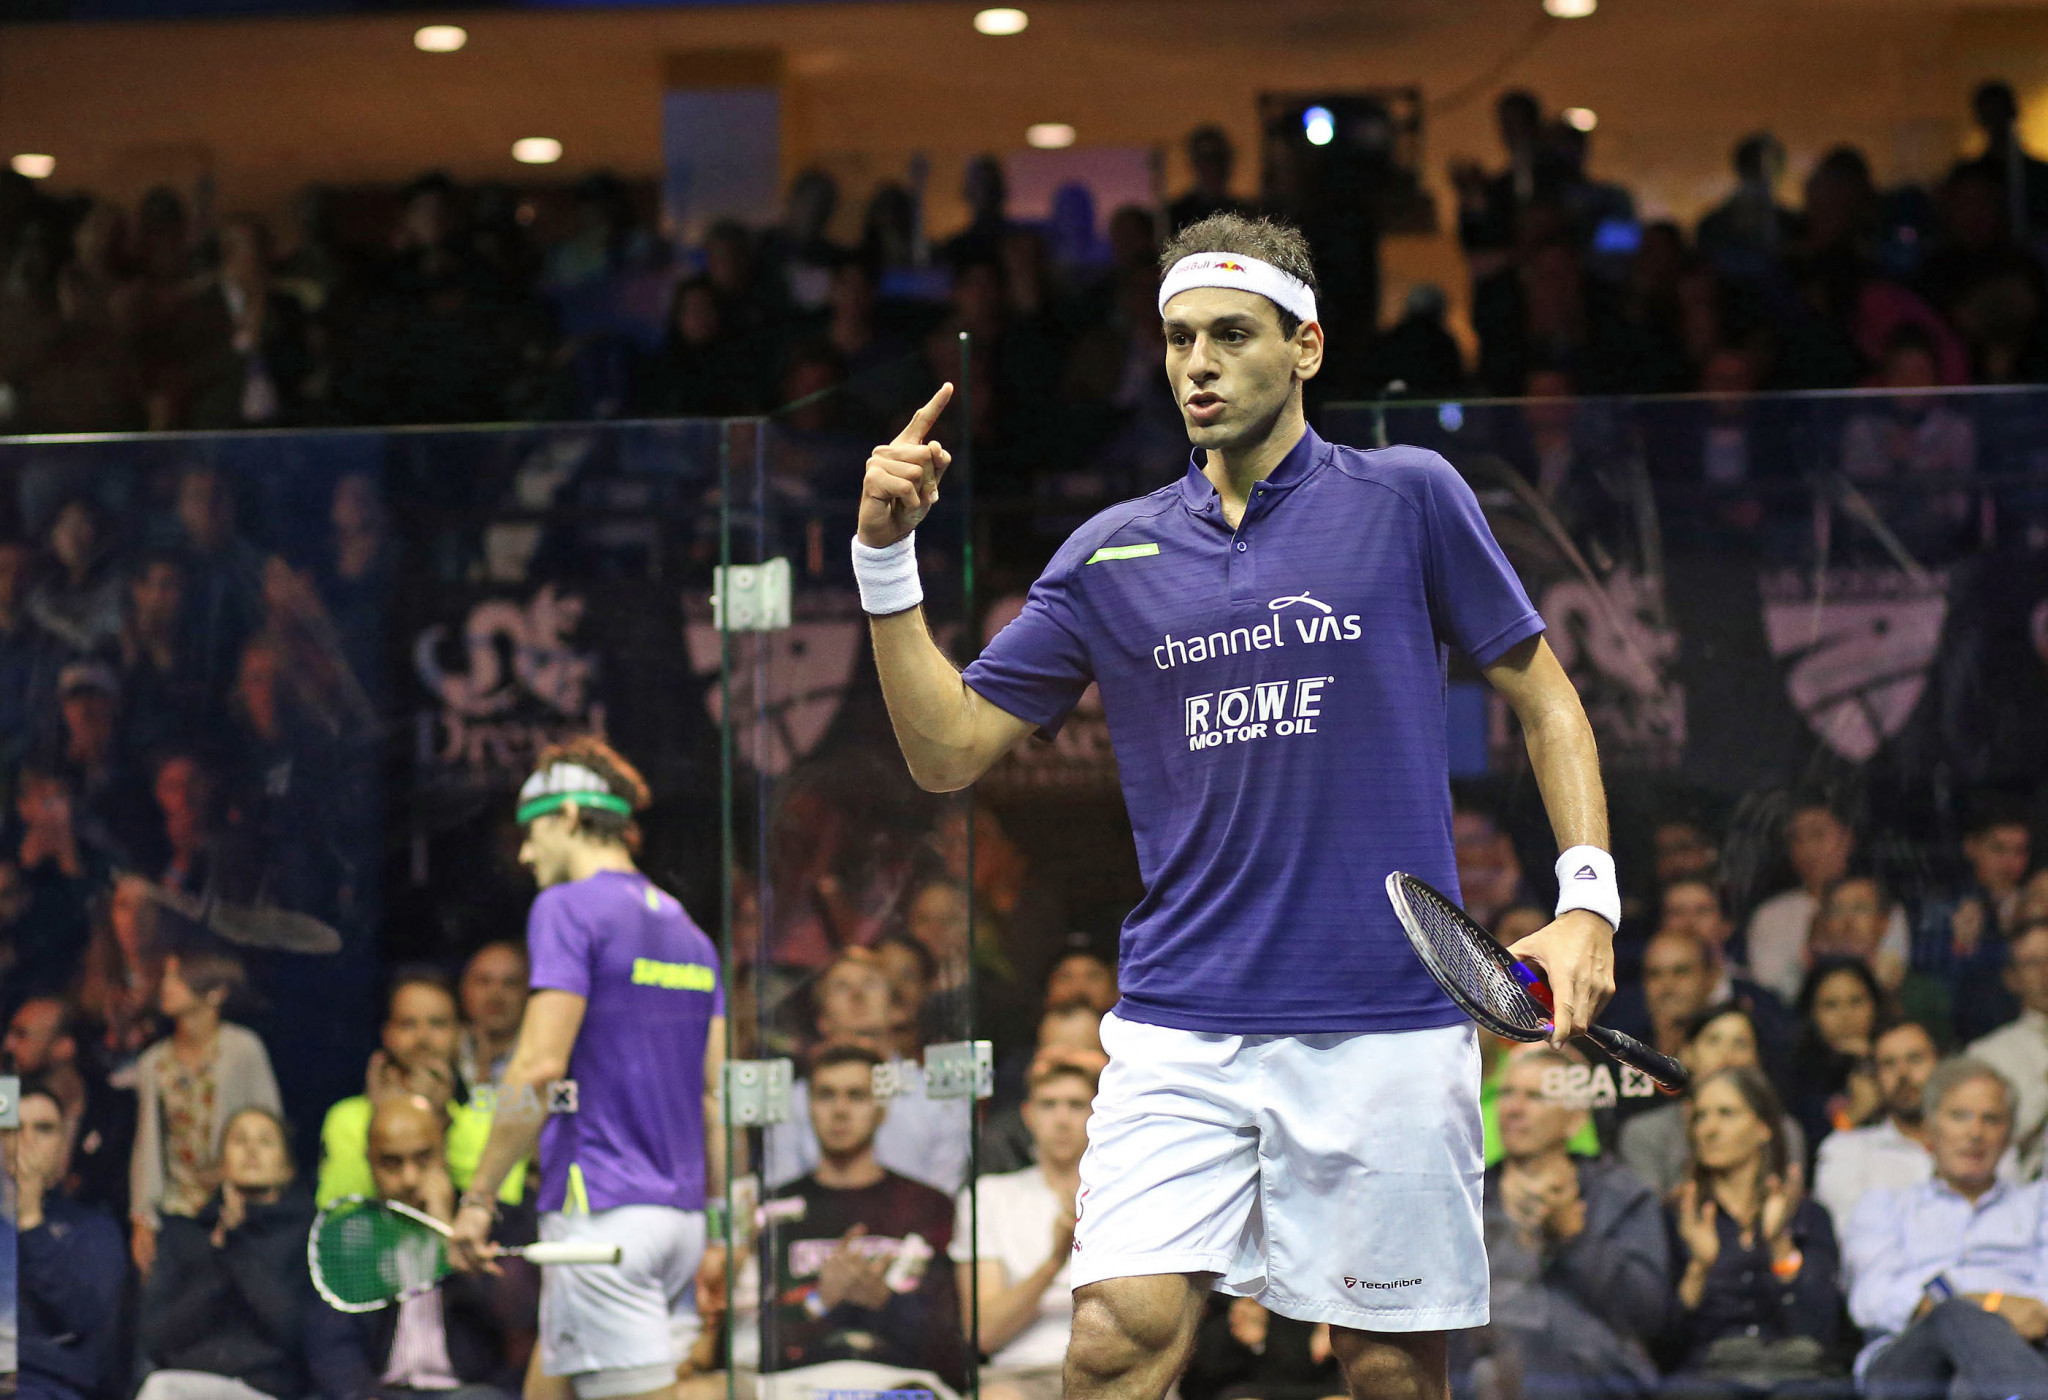 Recent US Open champion Mohamed Elshorbagy currently tops the PSA World Tour leaderboard ©PSA